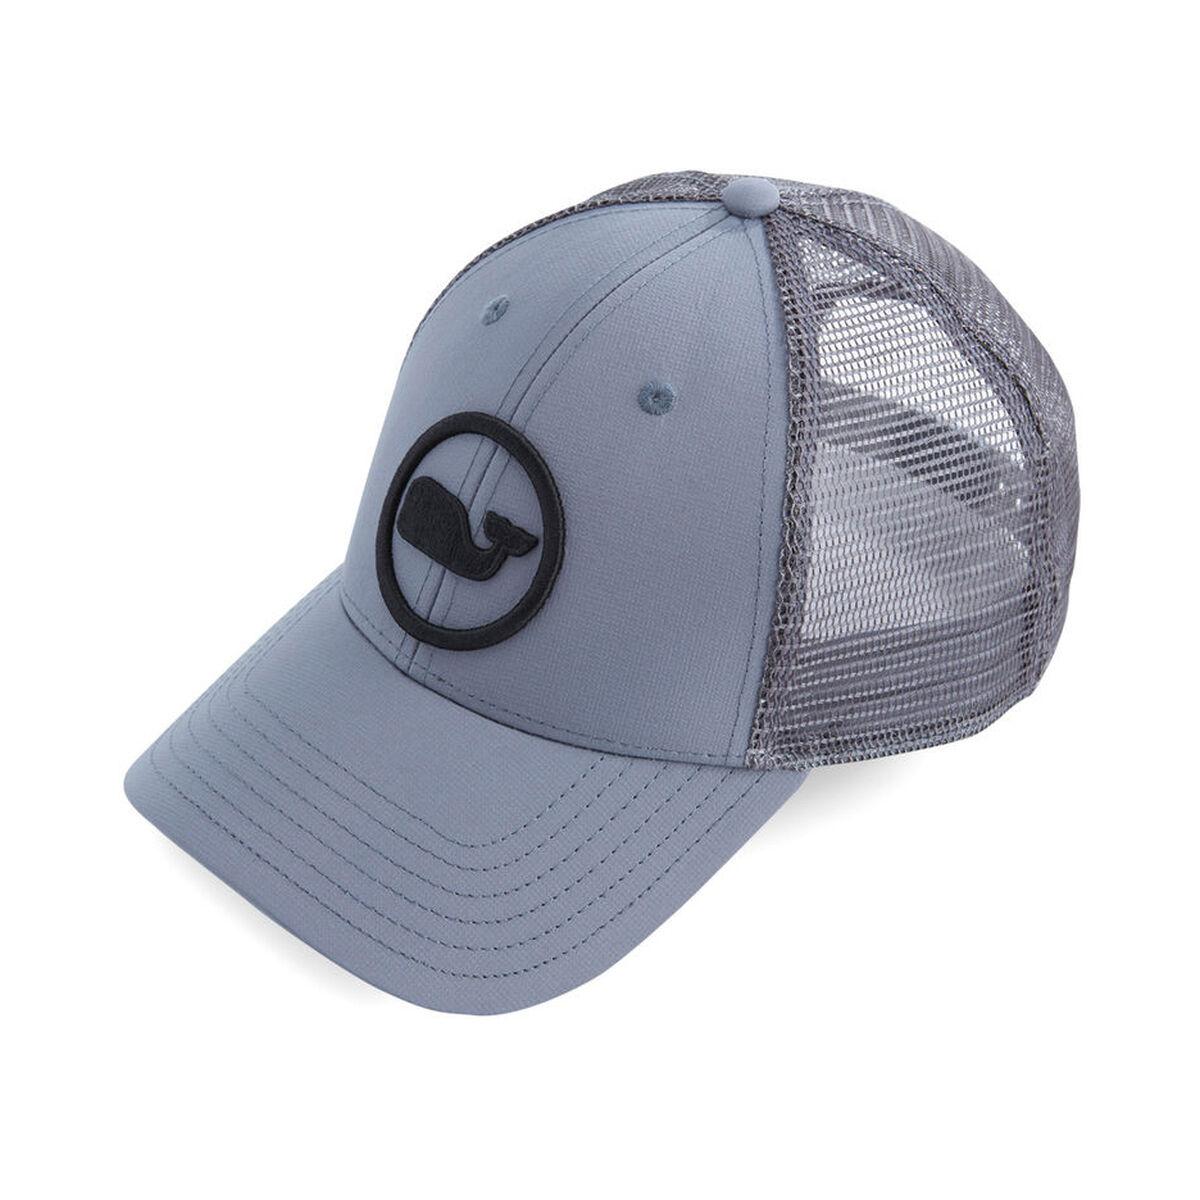 Images. Vineyard Vines Whale Dot Performance Trucker Hat ac38b74533f9